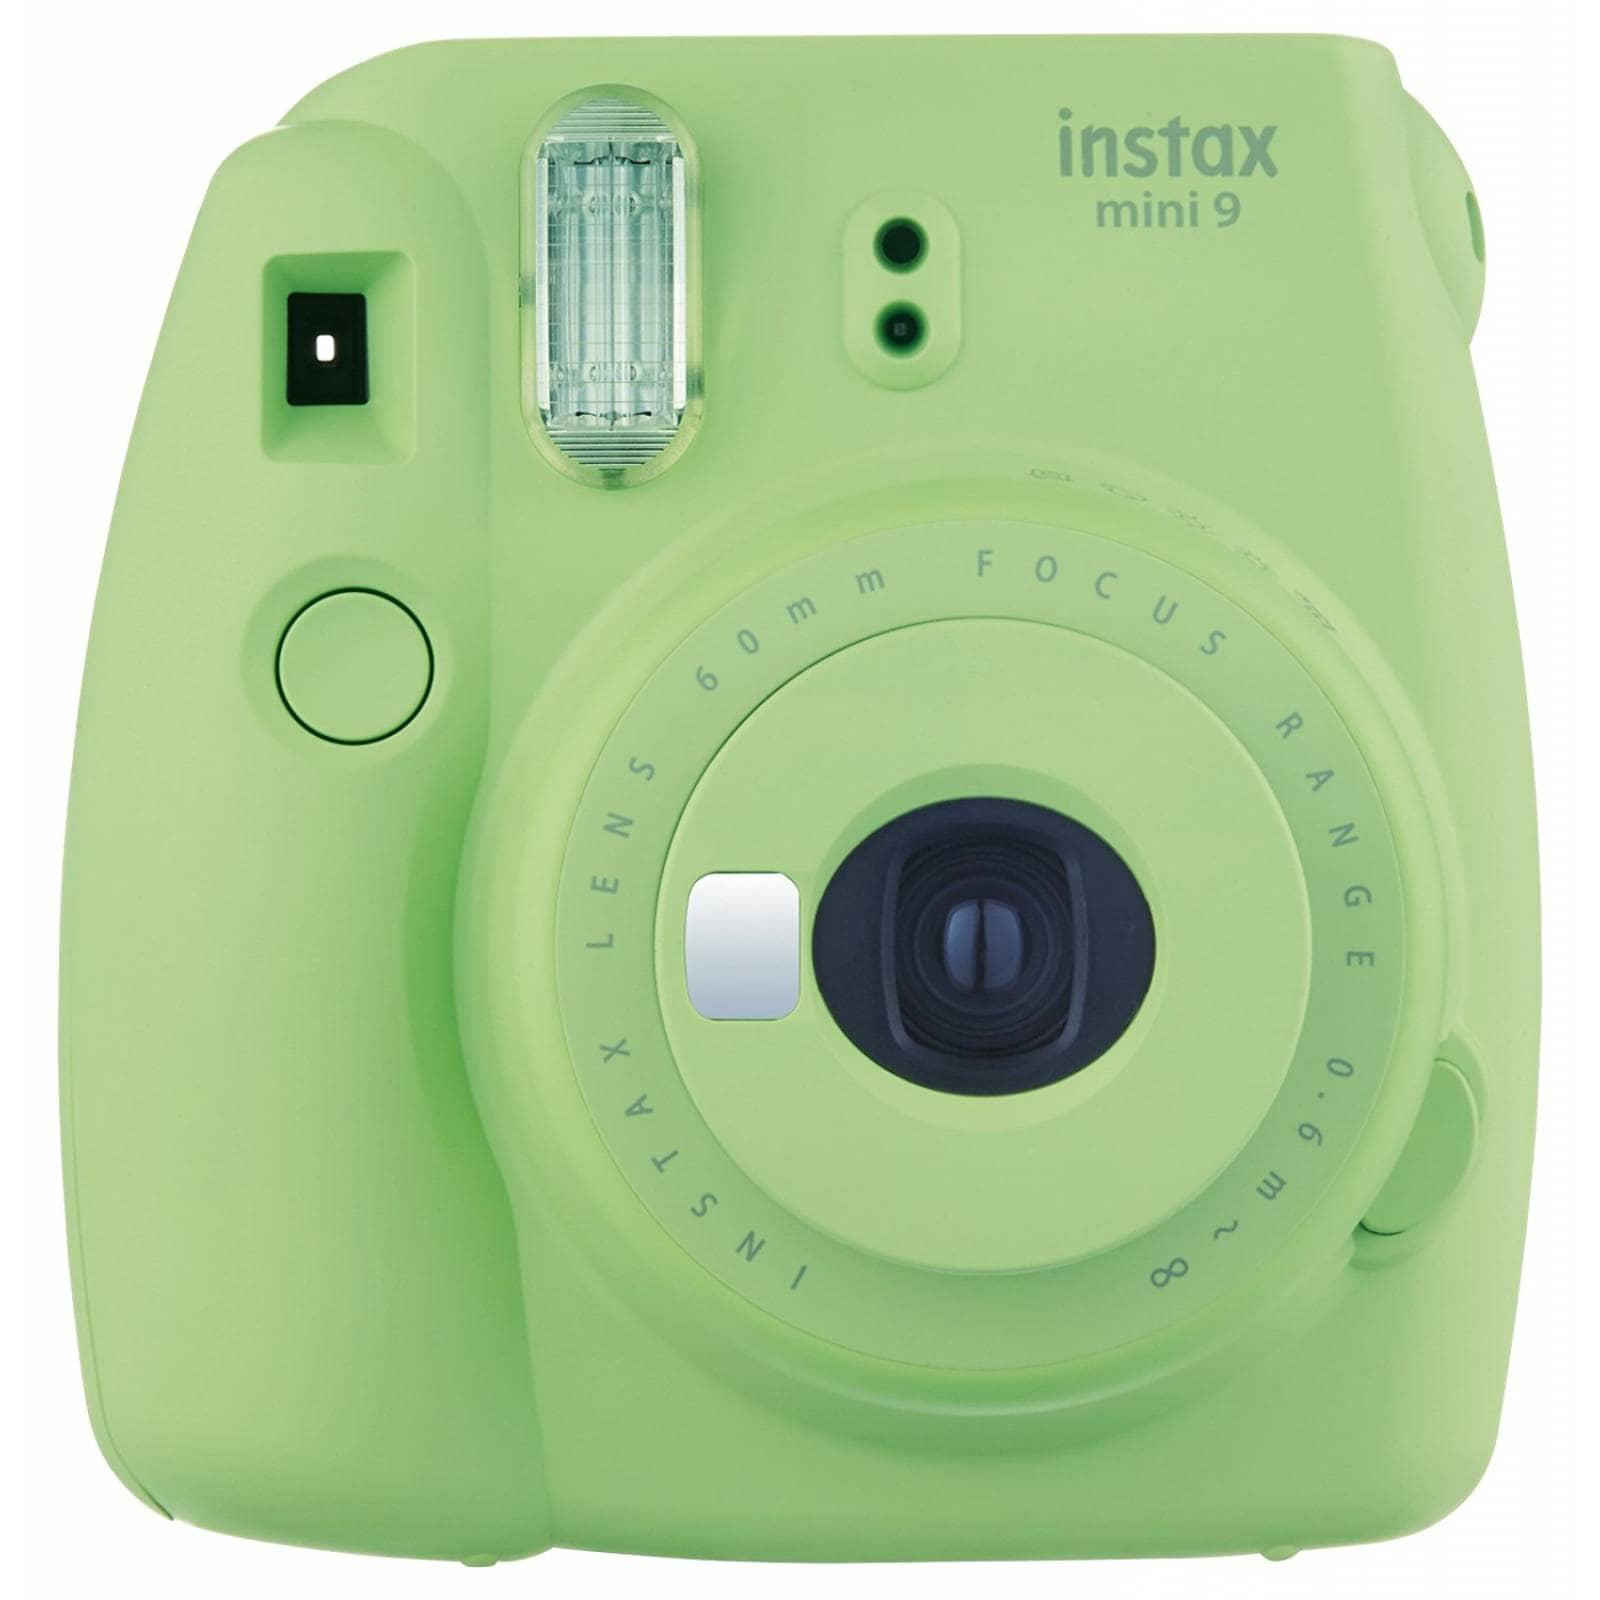 Cámara Instax Mini 9 Fujifilm Para Fotos Instantáneas -verde